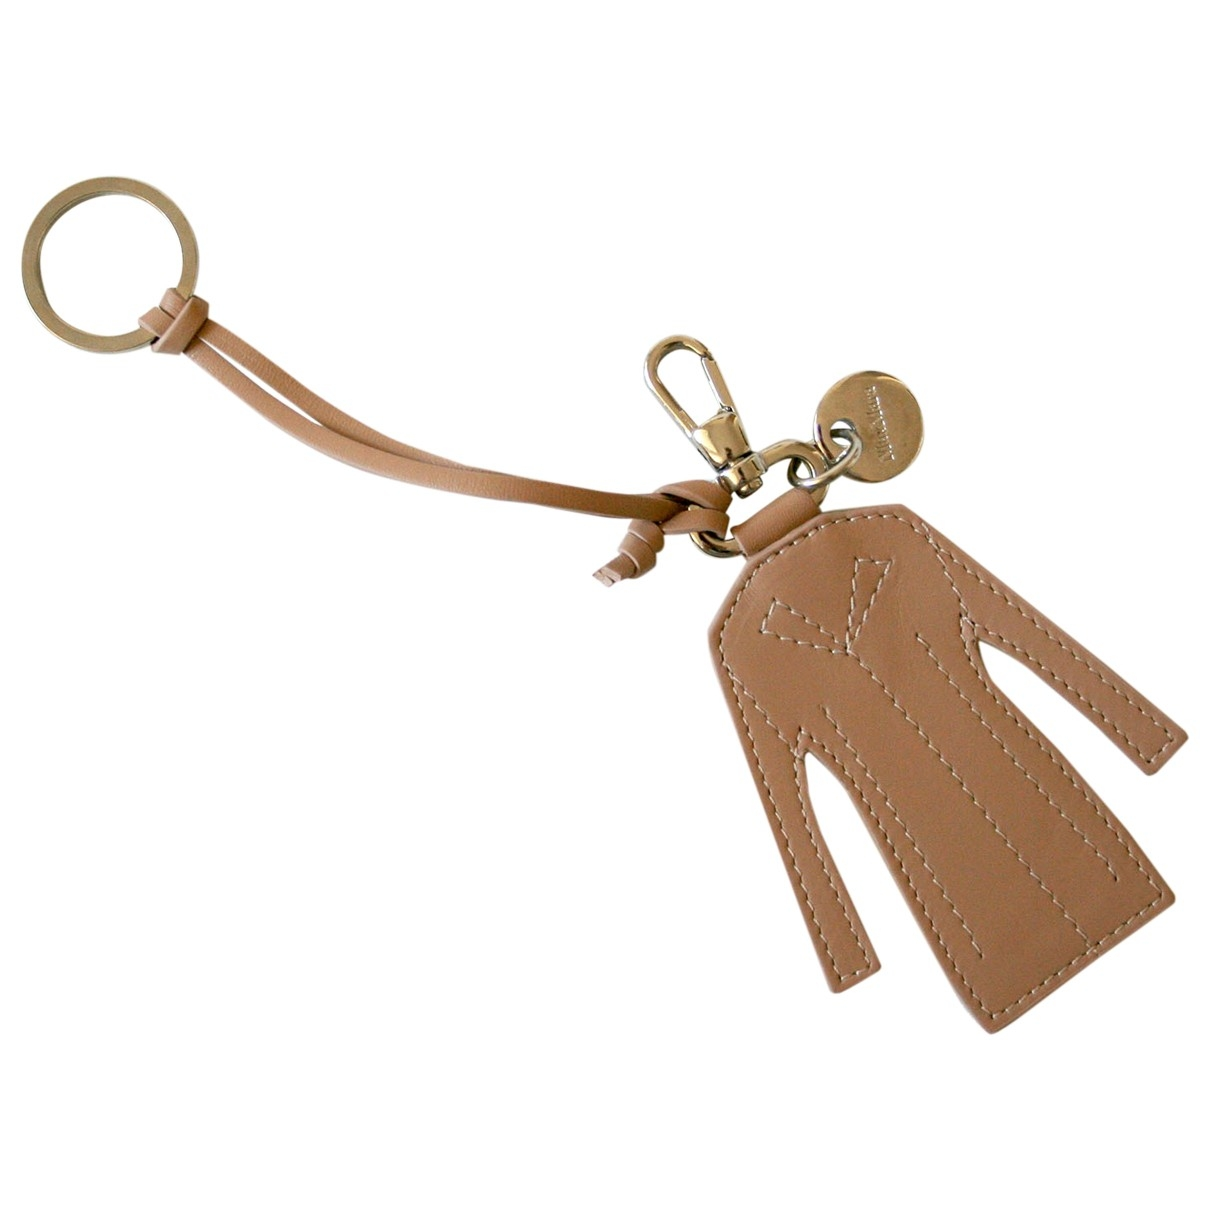 Max Mara - Bijoux de sac   pour femme en cuir - camel